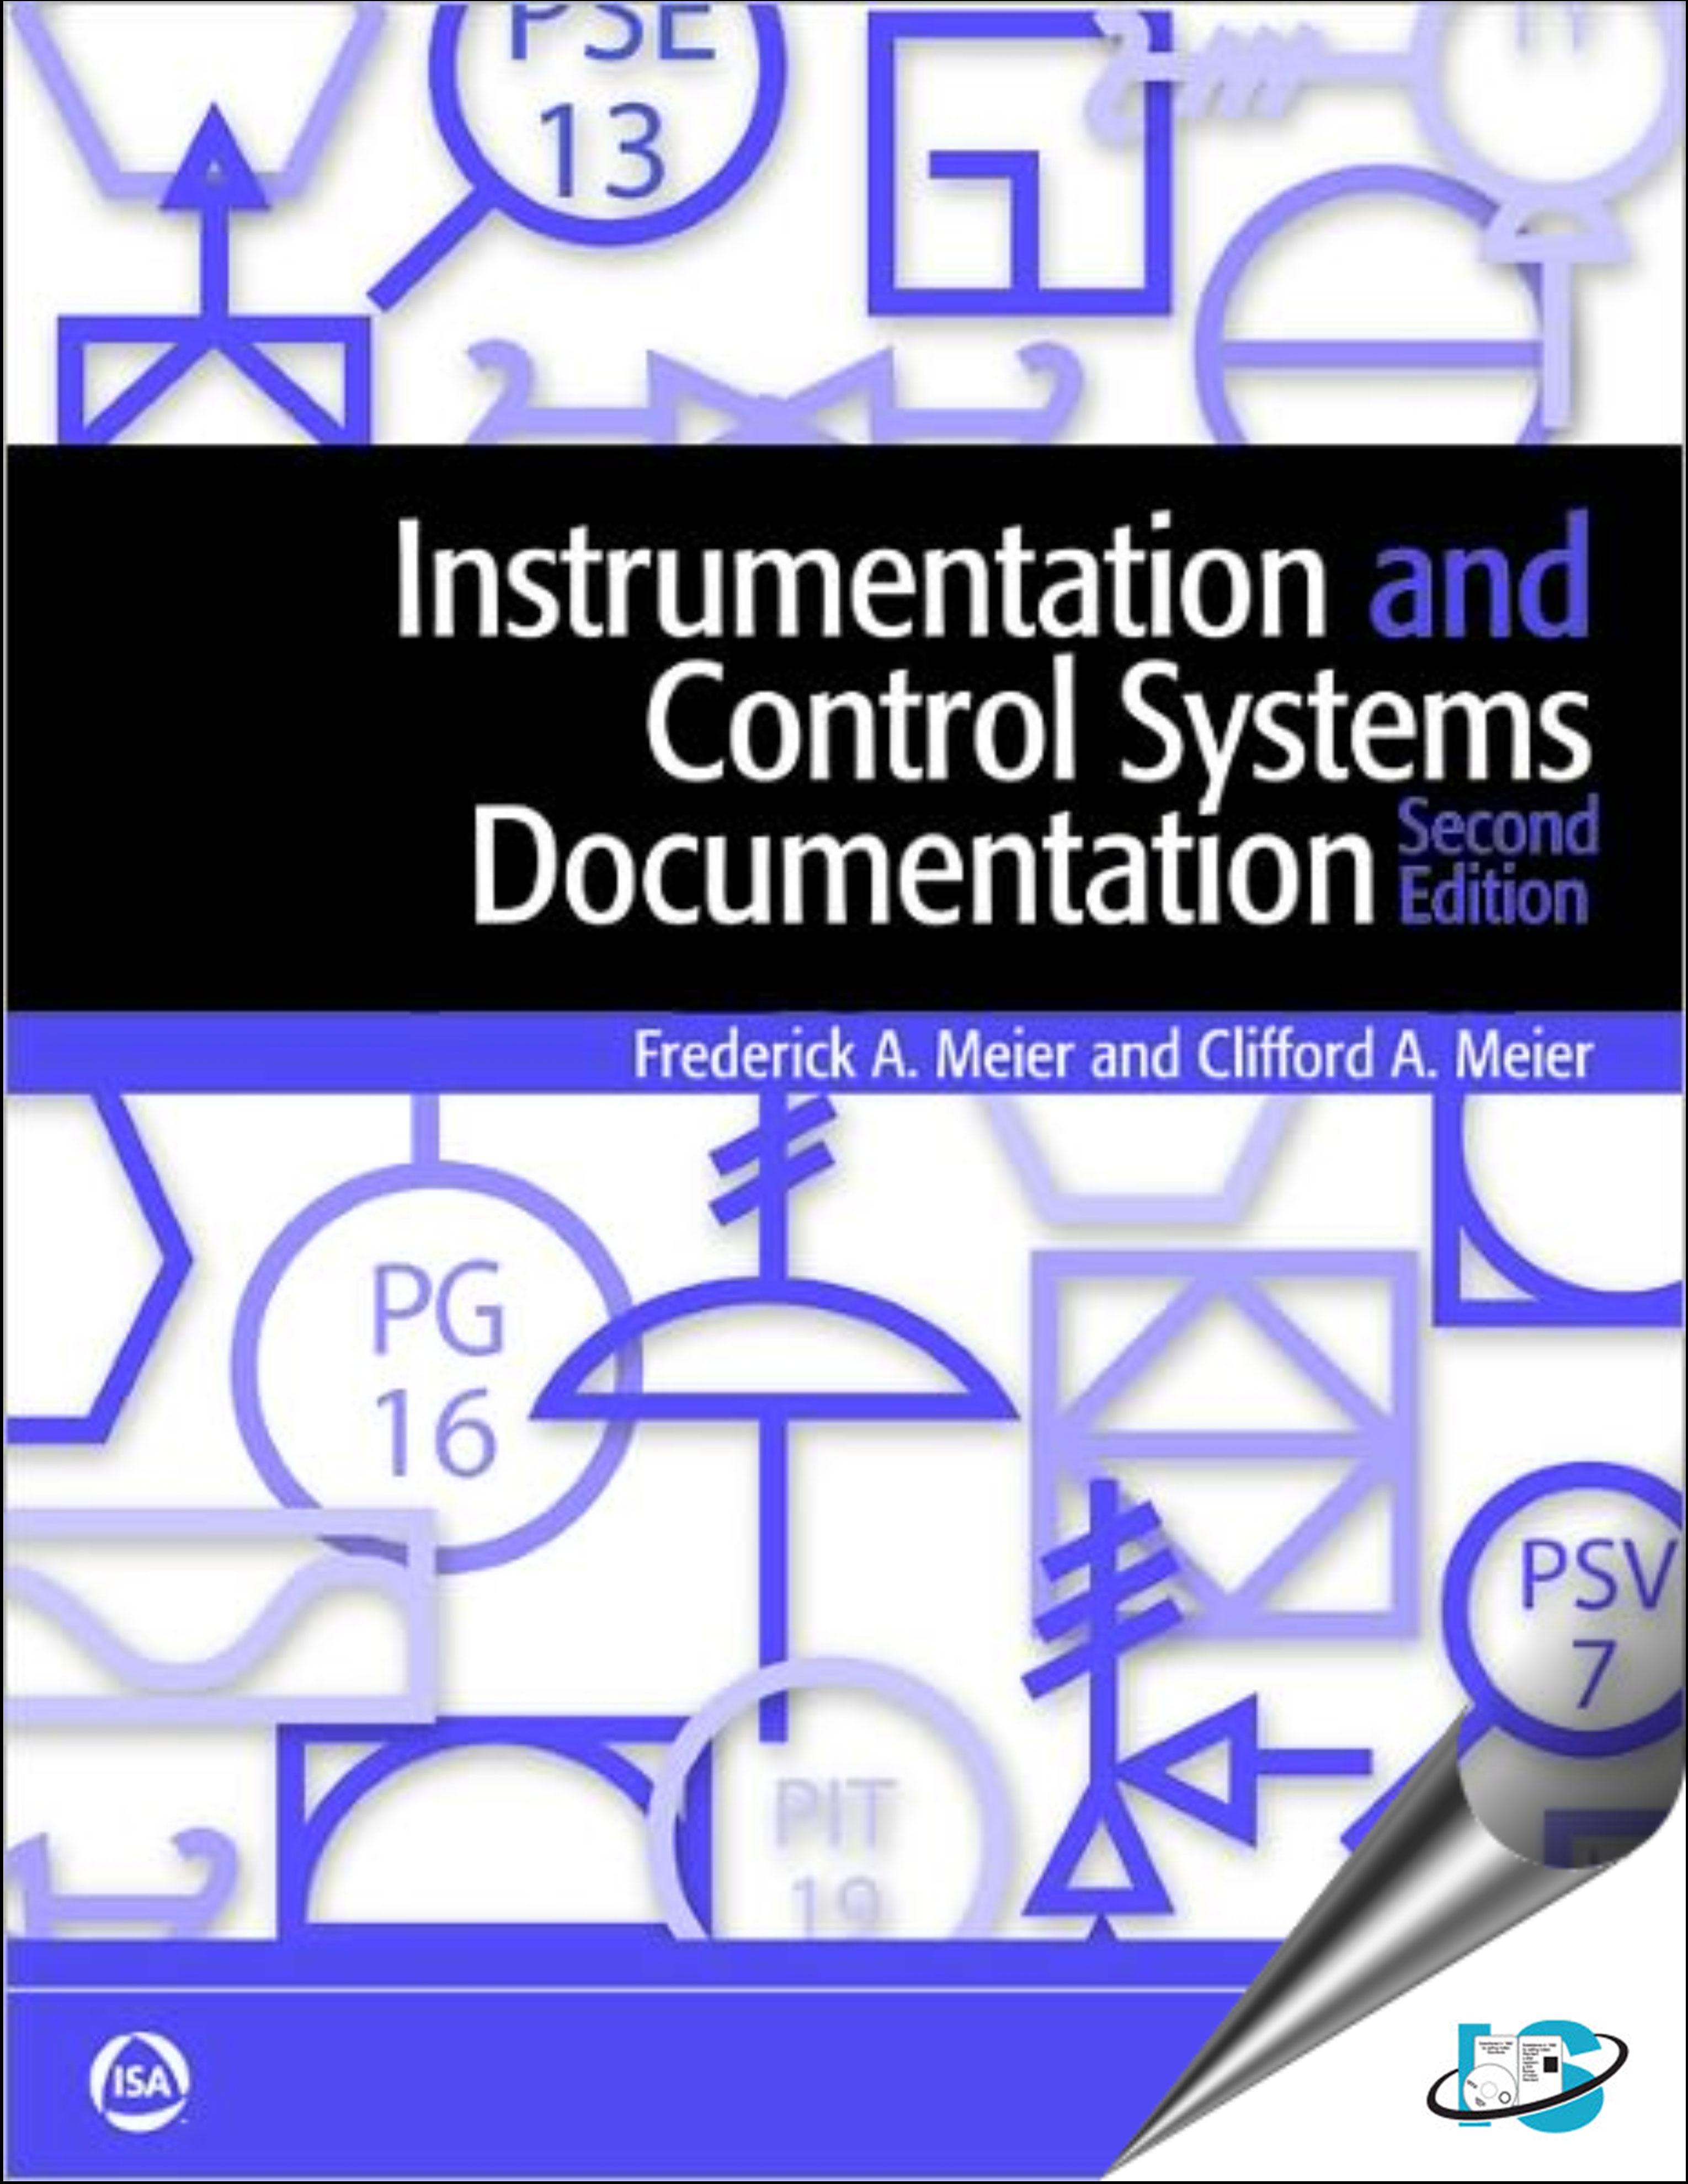 Instrumentation And Control Systems Documentation 2nd Edition Logic Diagram Clifford A Meier Frederick 1936007517 9781936007516